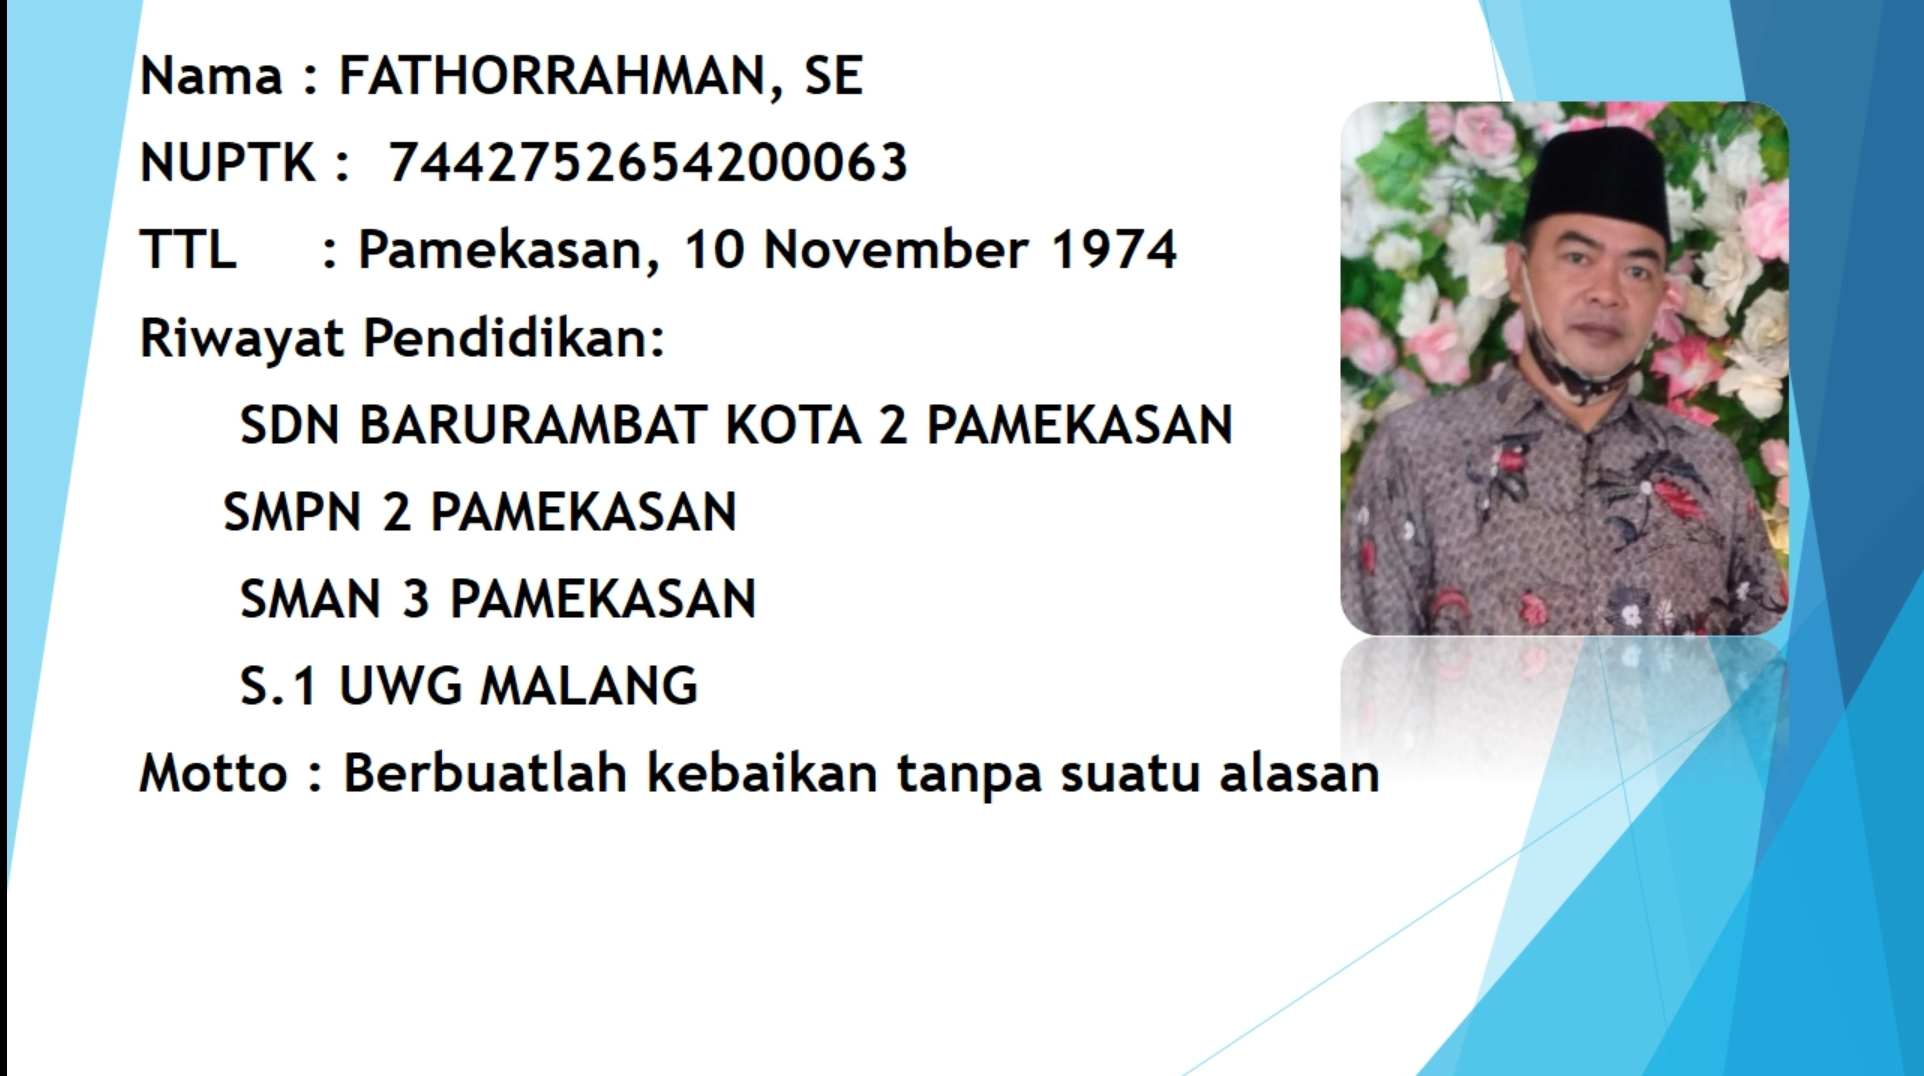 Fathorrahman, S.E